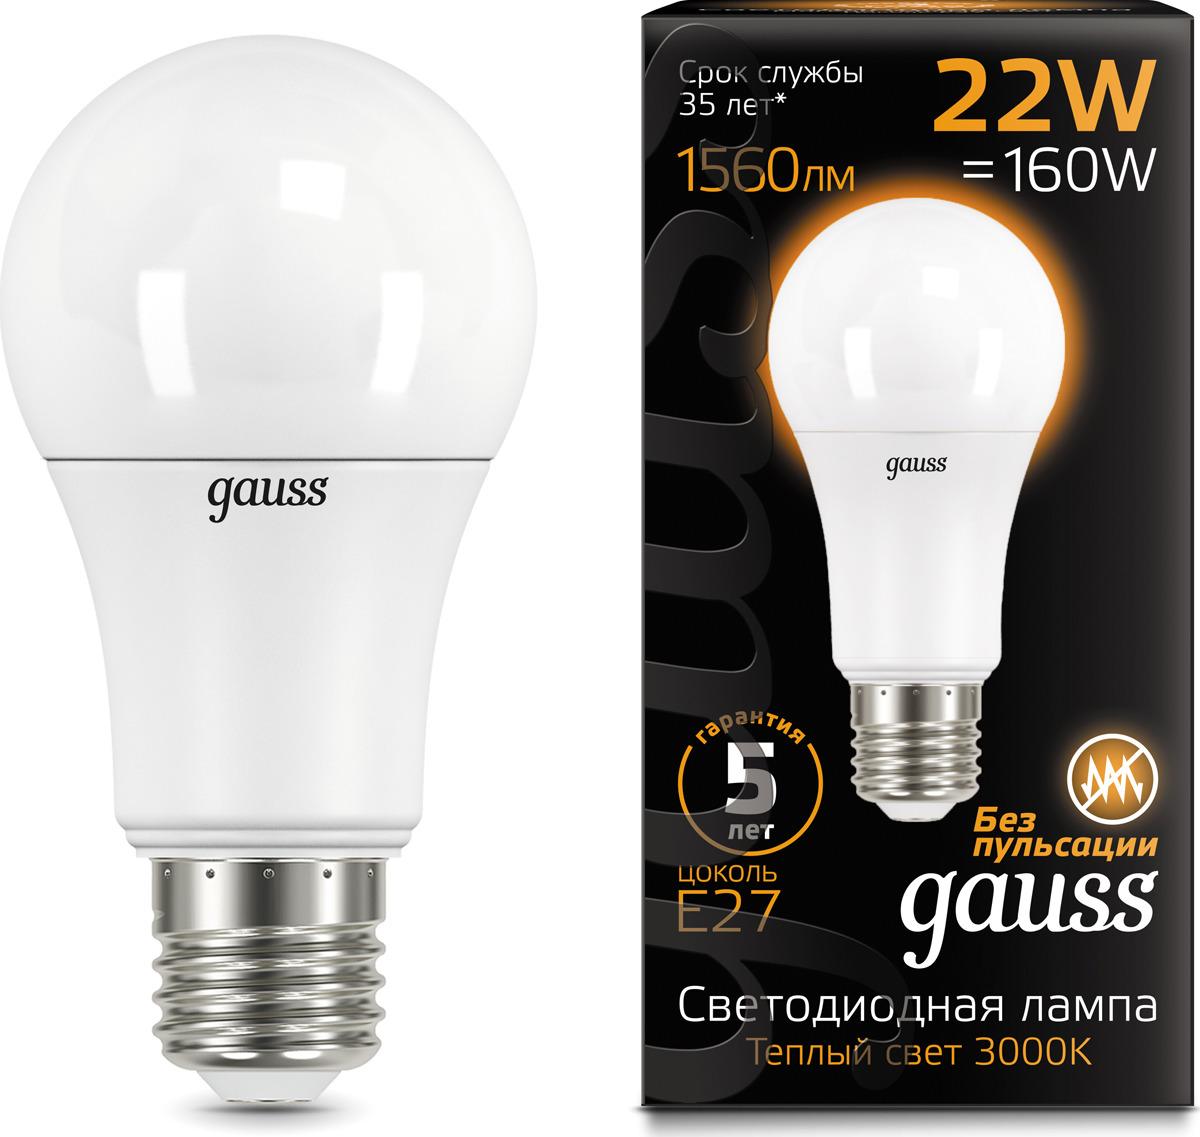 Лампочка Gauss Black LED, A70, E27, 22W. 102502122 gauss black led a70 e27 22w 4100k 102502222